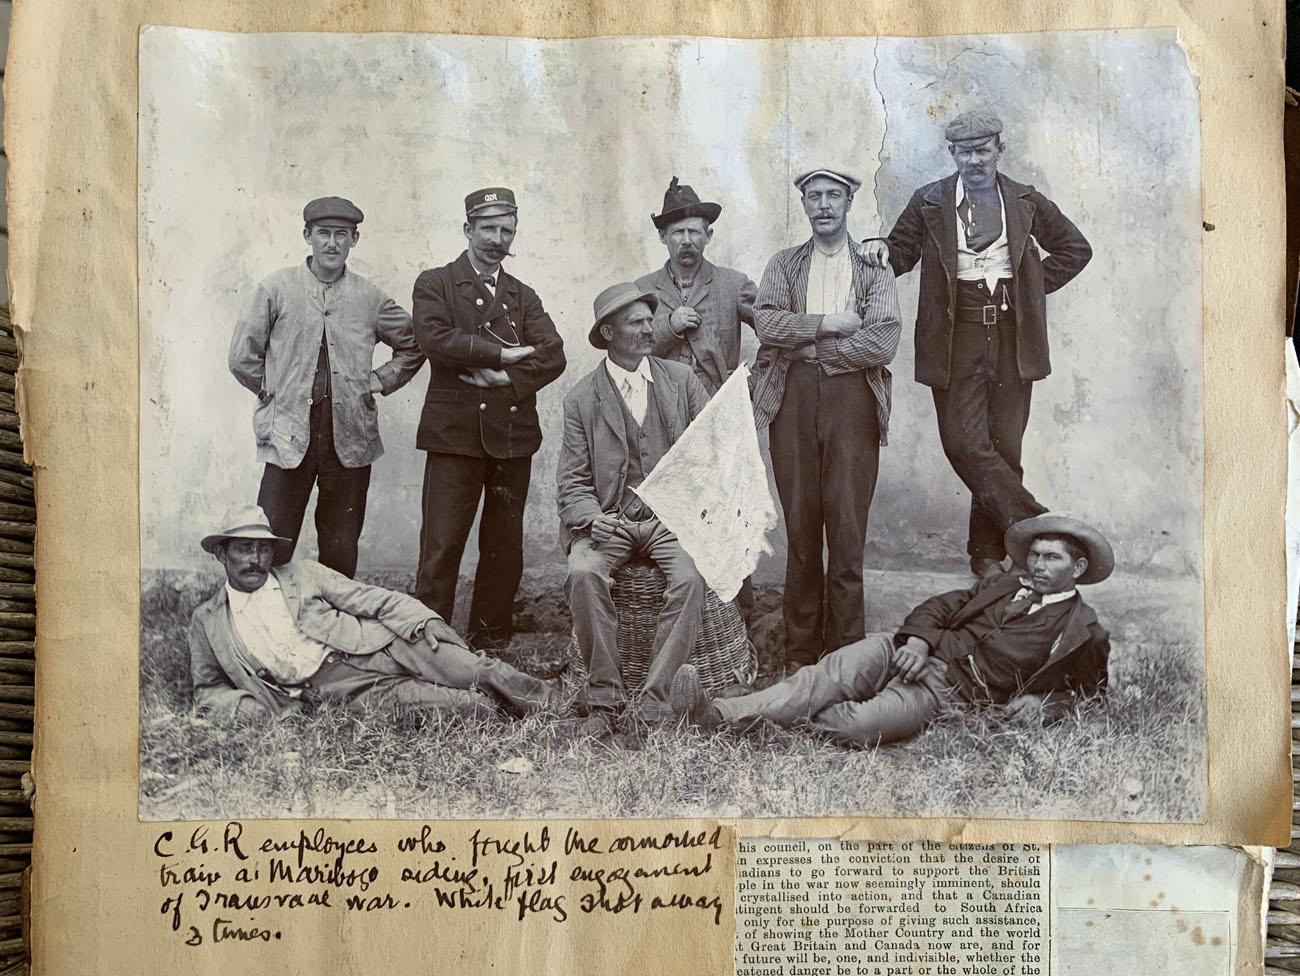 1899_CGR_employees_maribogo_siding.jpg